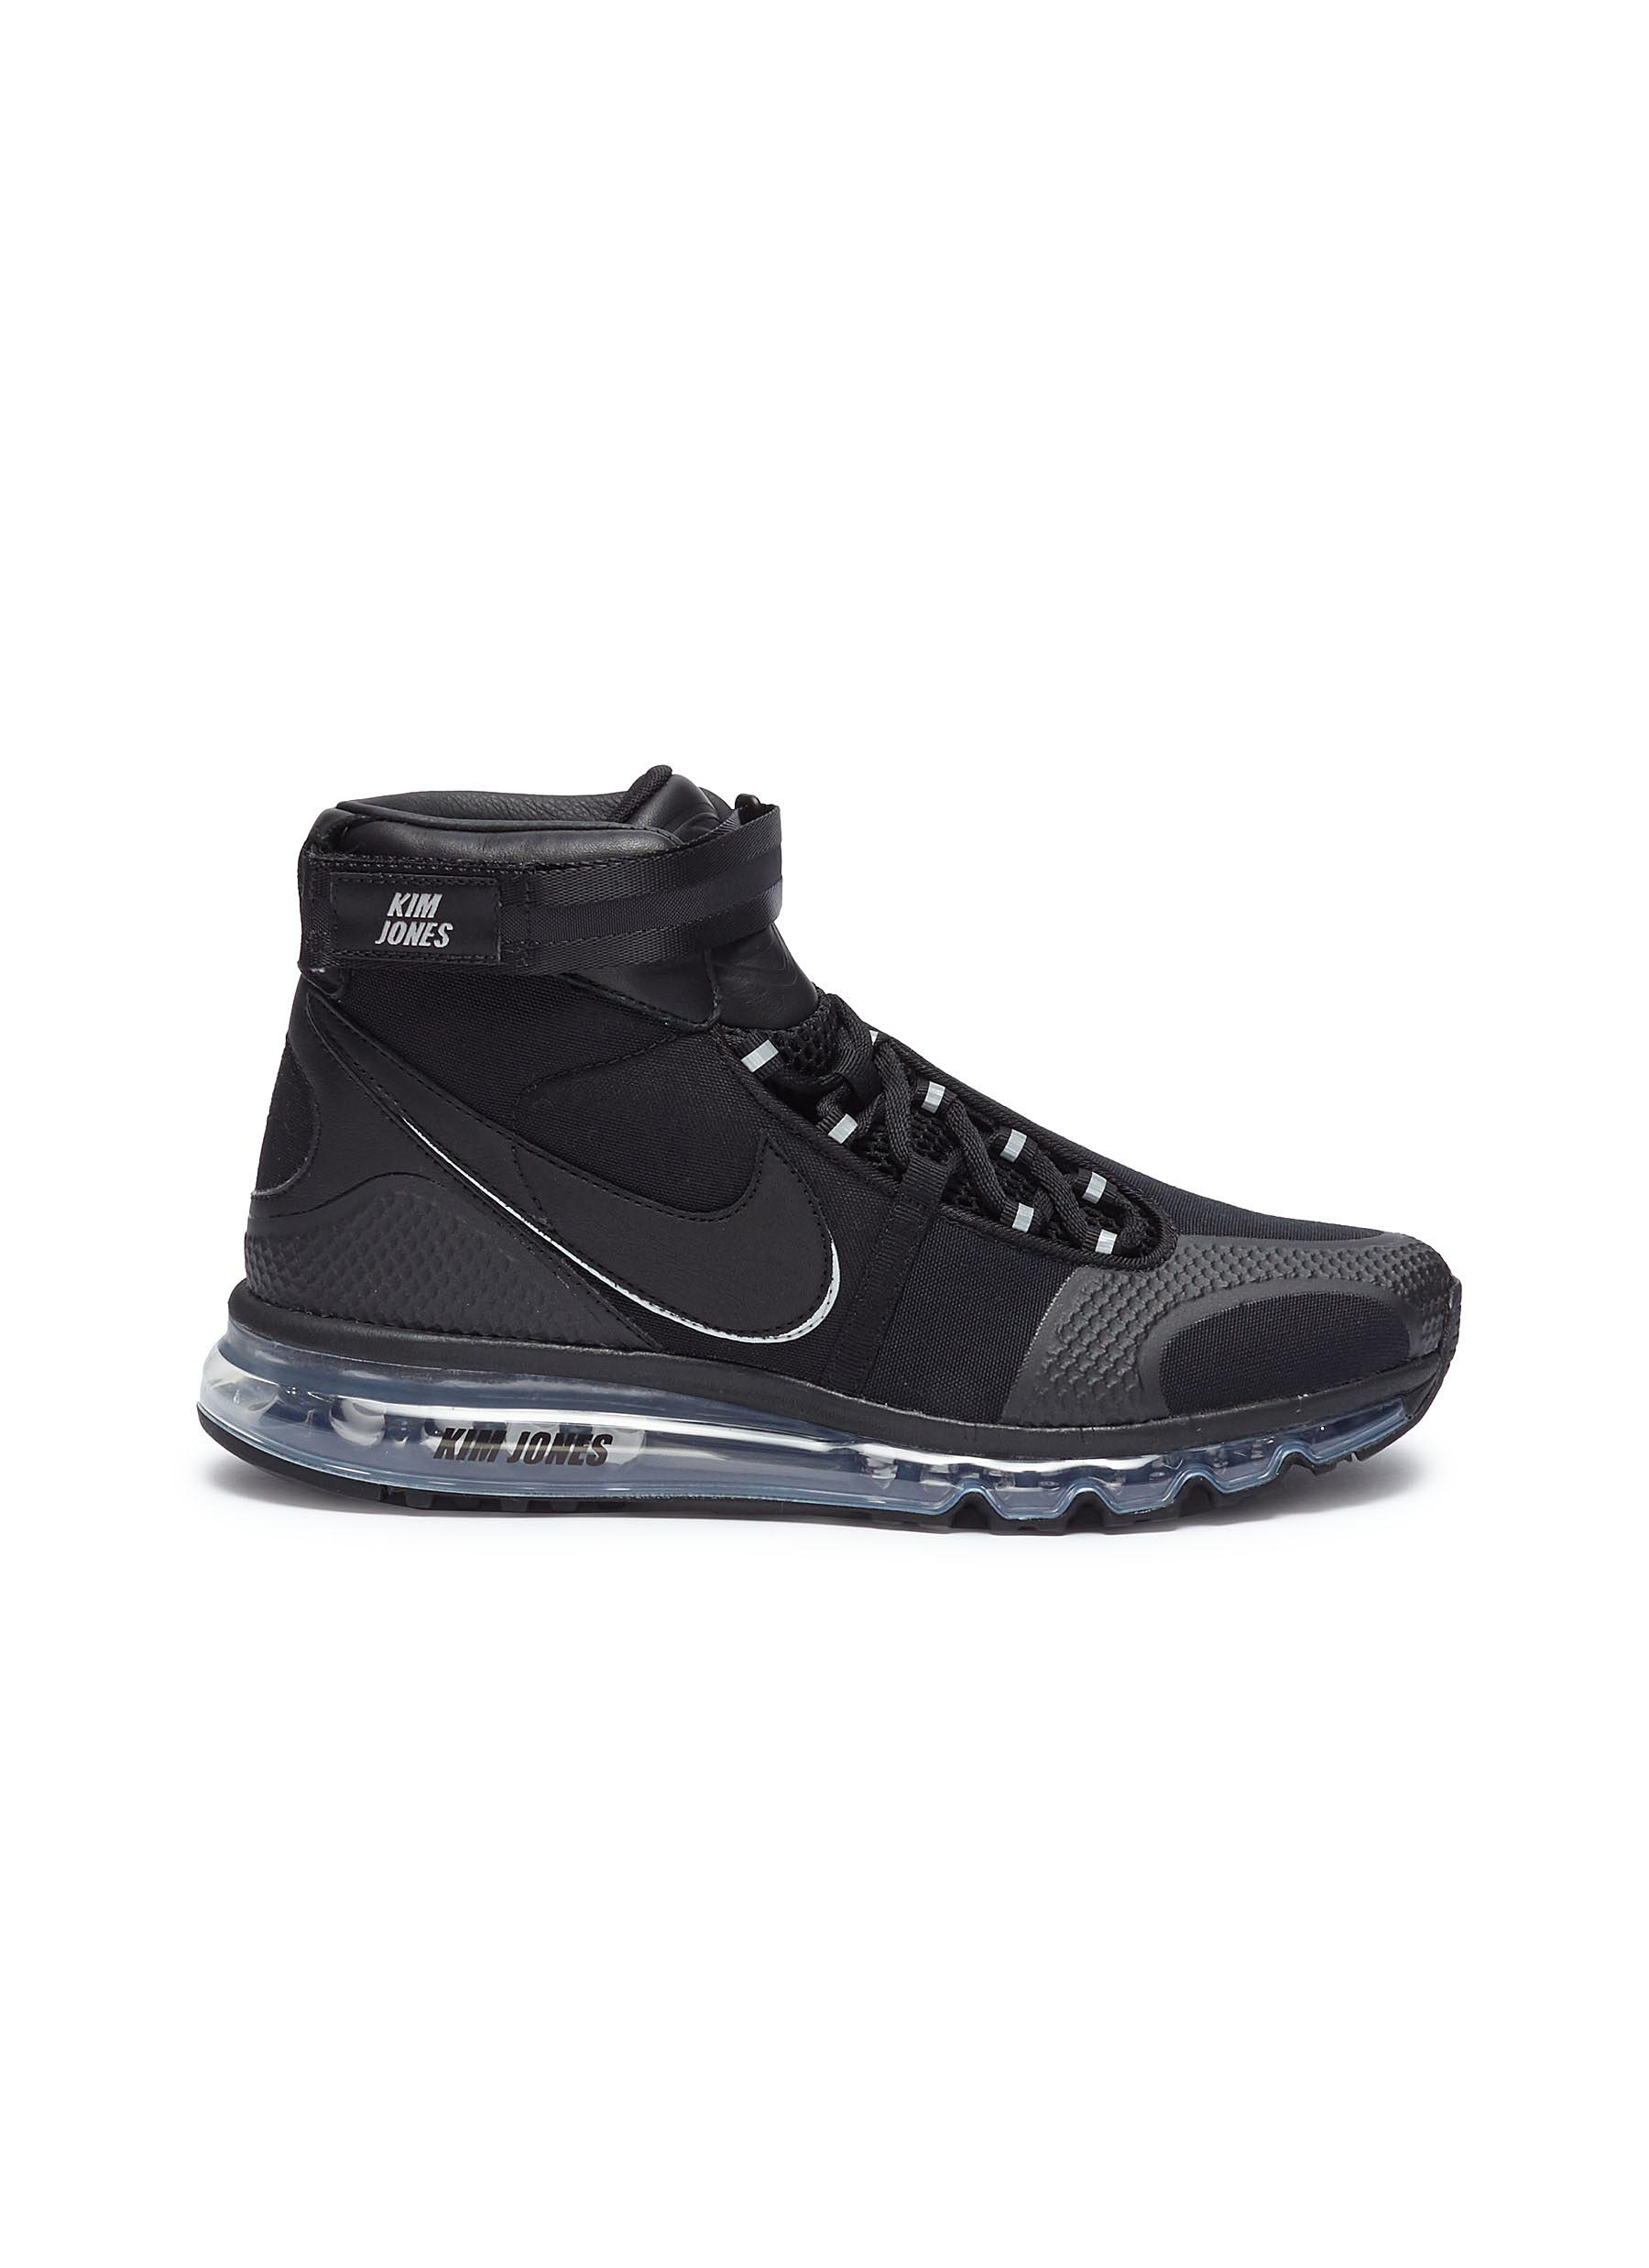 Rick Owens Black Kim Jones Edition Air Max 360 High-Top Sneakers 4wjKtmnpm